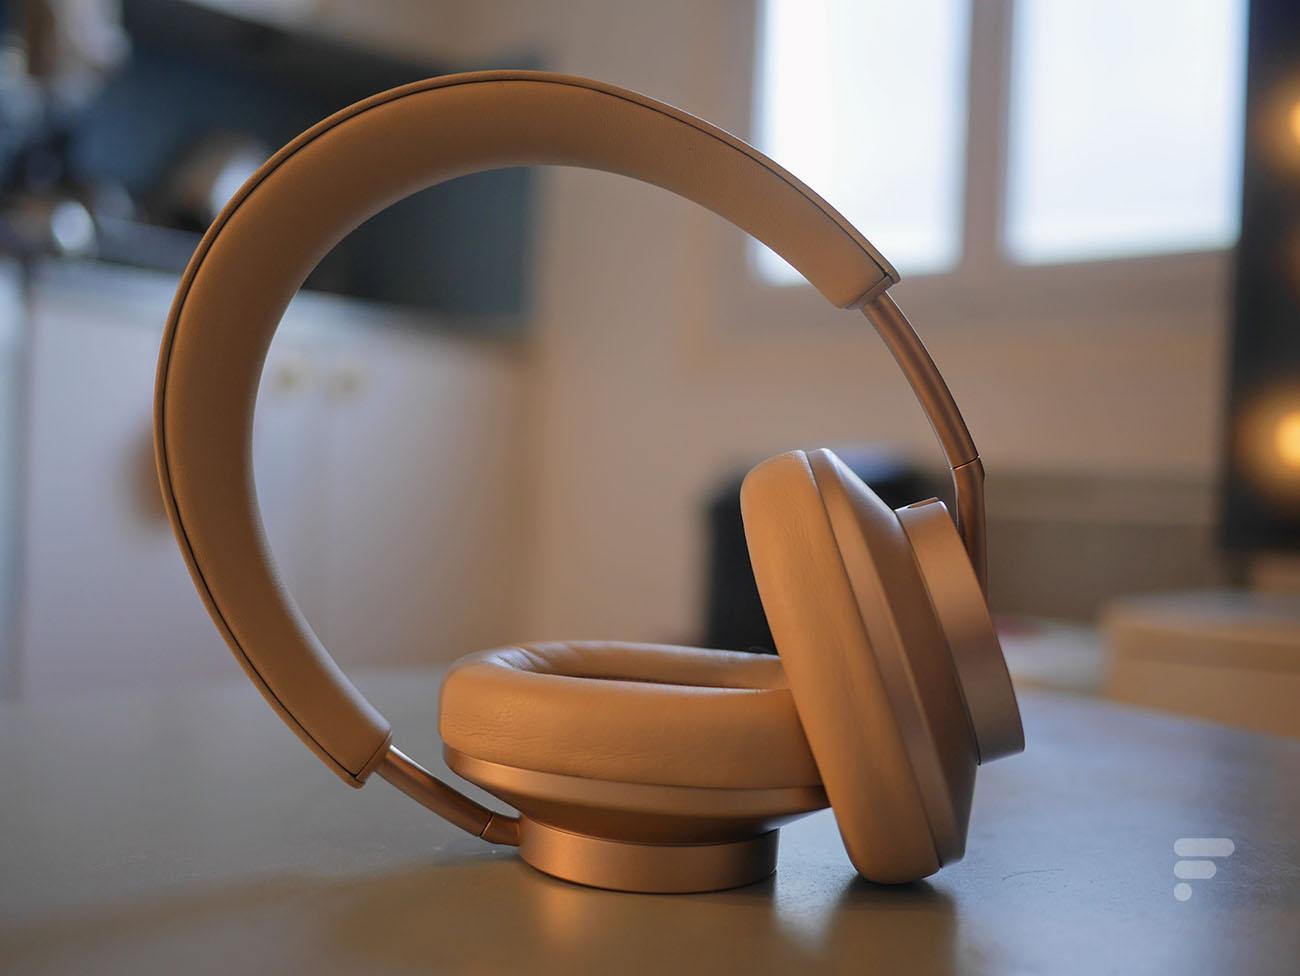 Test du Huawei FreeBuds Studio: un premier casque Bluetooth plutôt encourageant